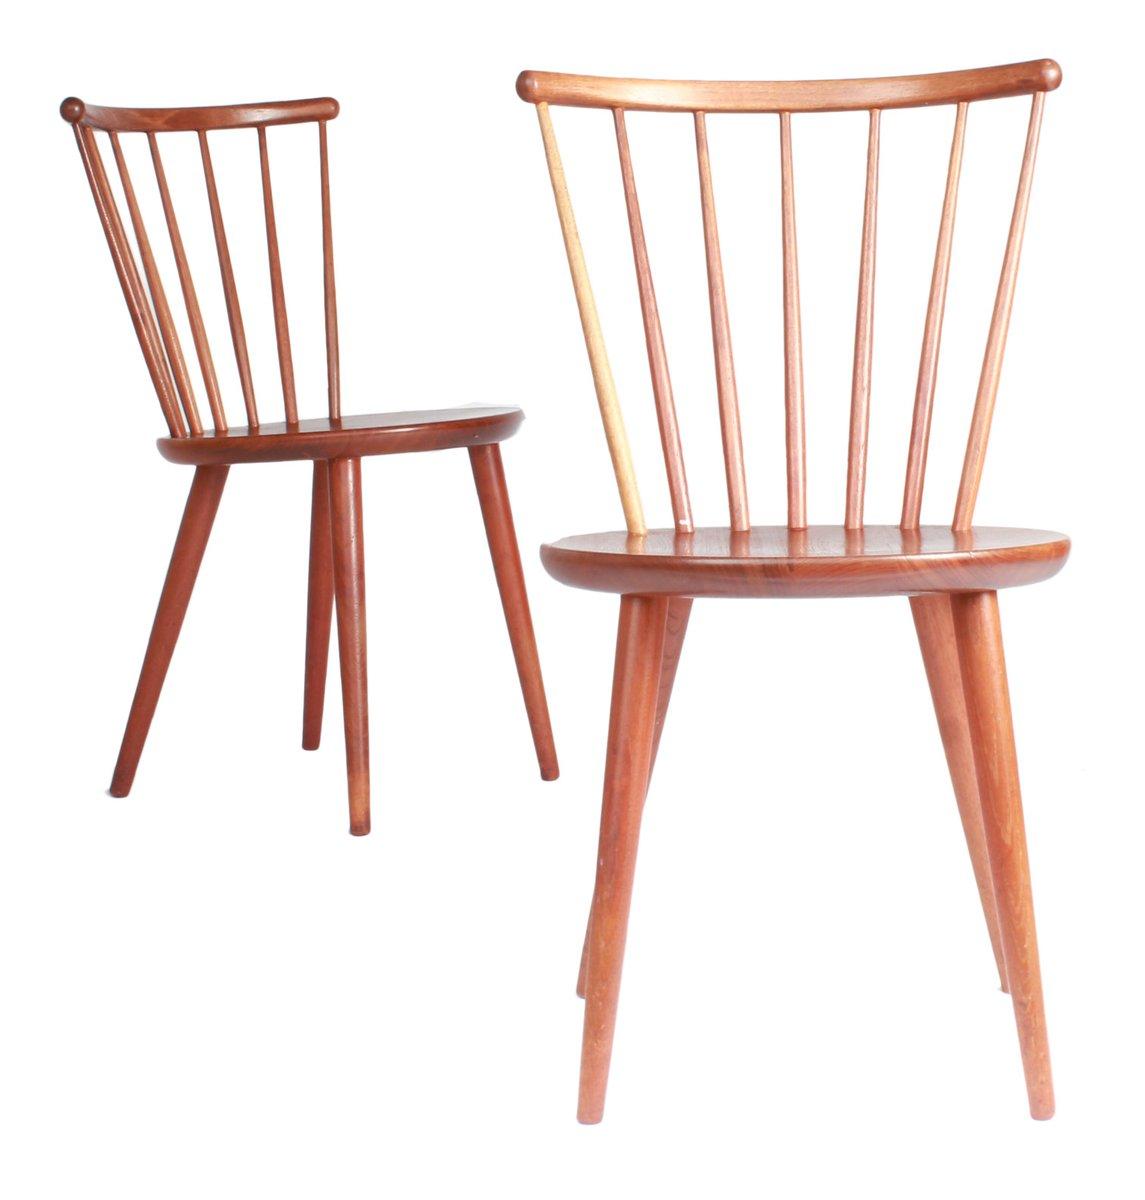 Stuhl Skandinavisch skandinavische vintage stuhl bei pamono kaufen